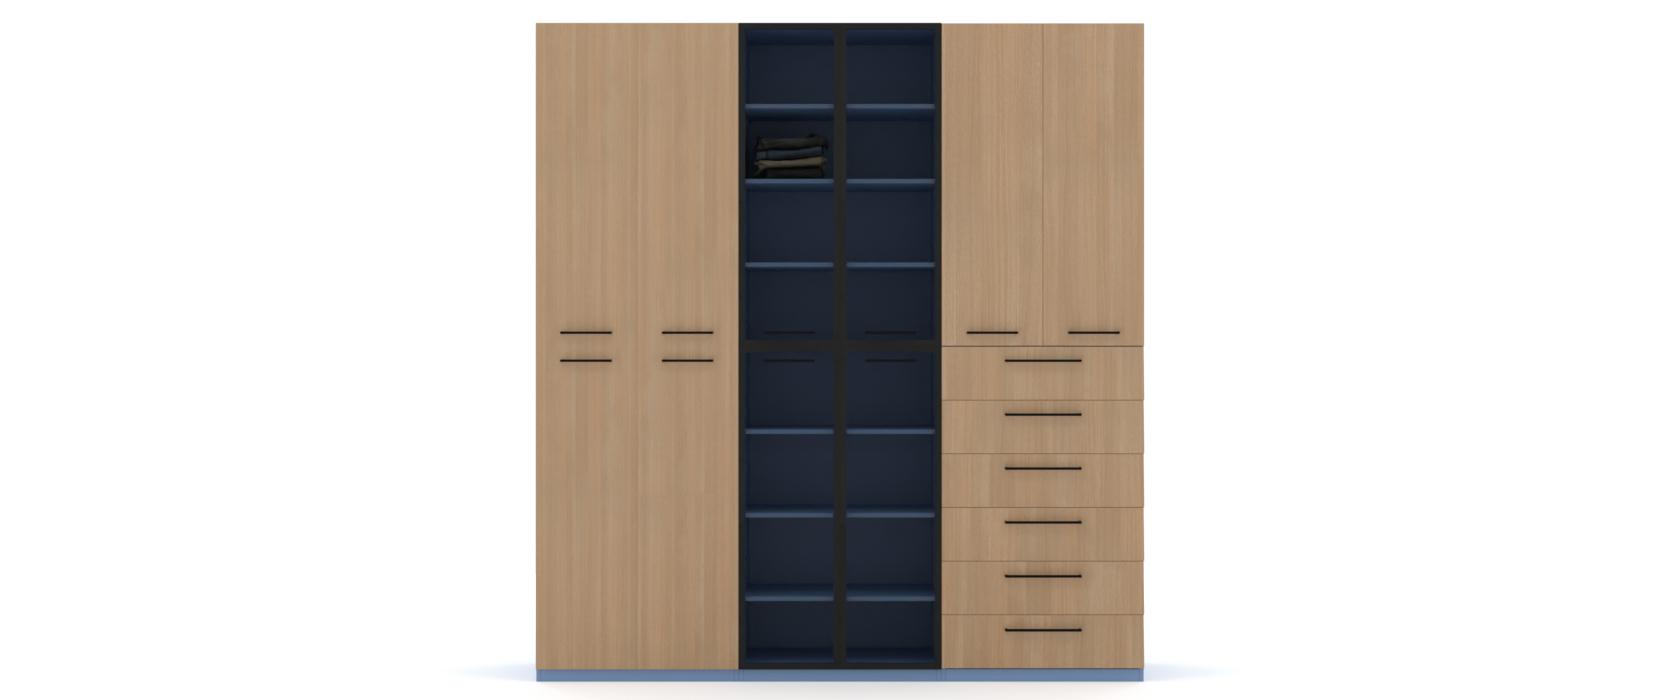 Шкаф Arino 3 модуля с комбинированными фасадами - Pufetto